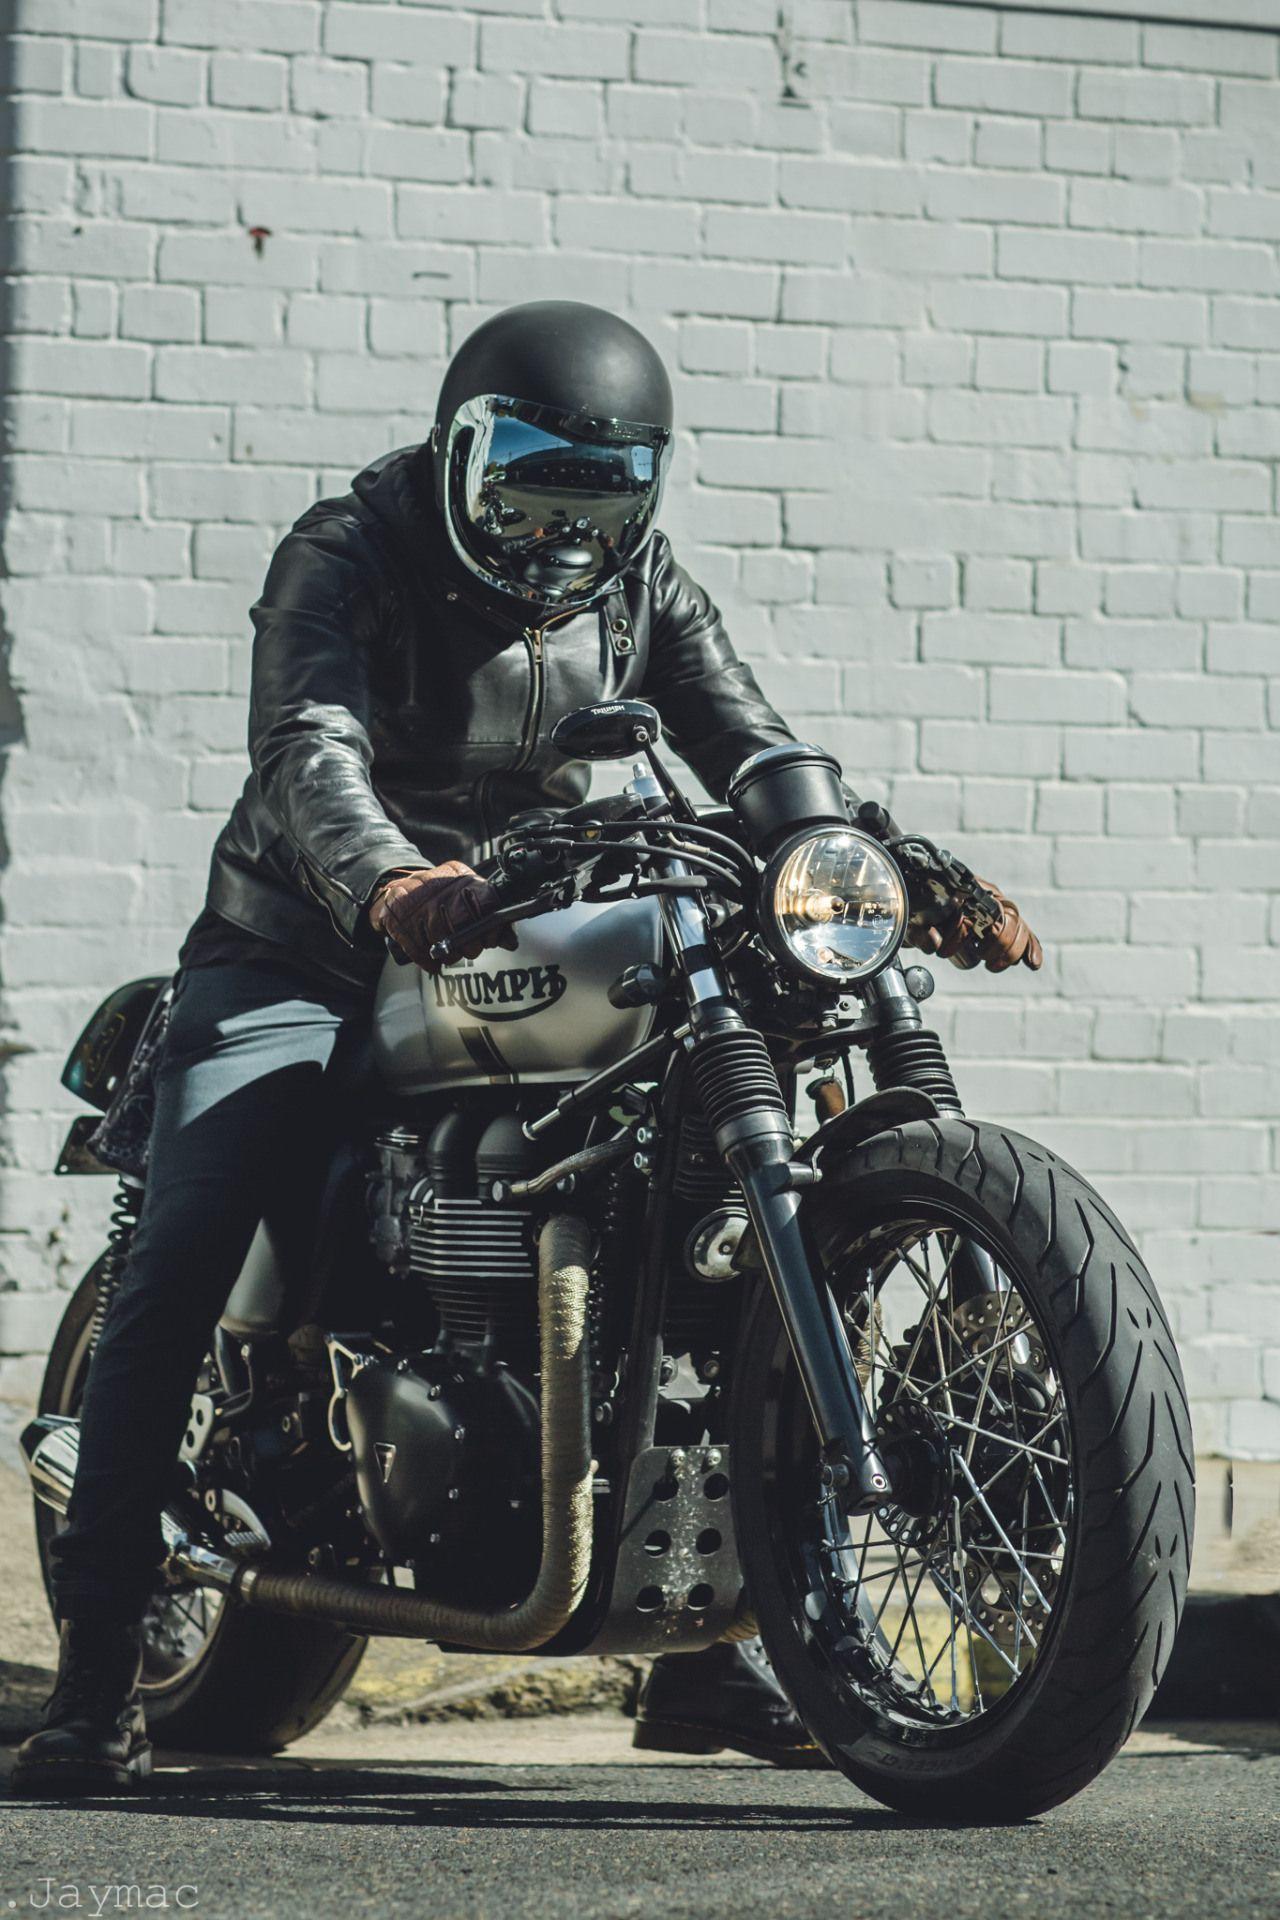 triumph motorcycles cars bikes motorrad retro bikes. Black Bedroom Furniture Sets. Home Design Ideas